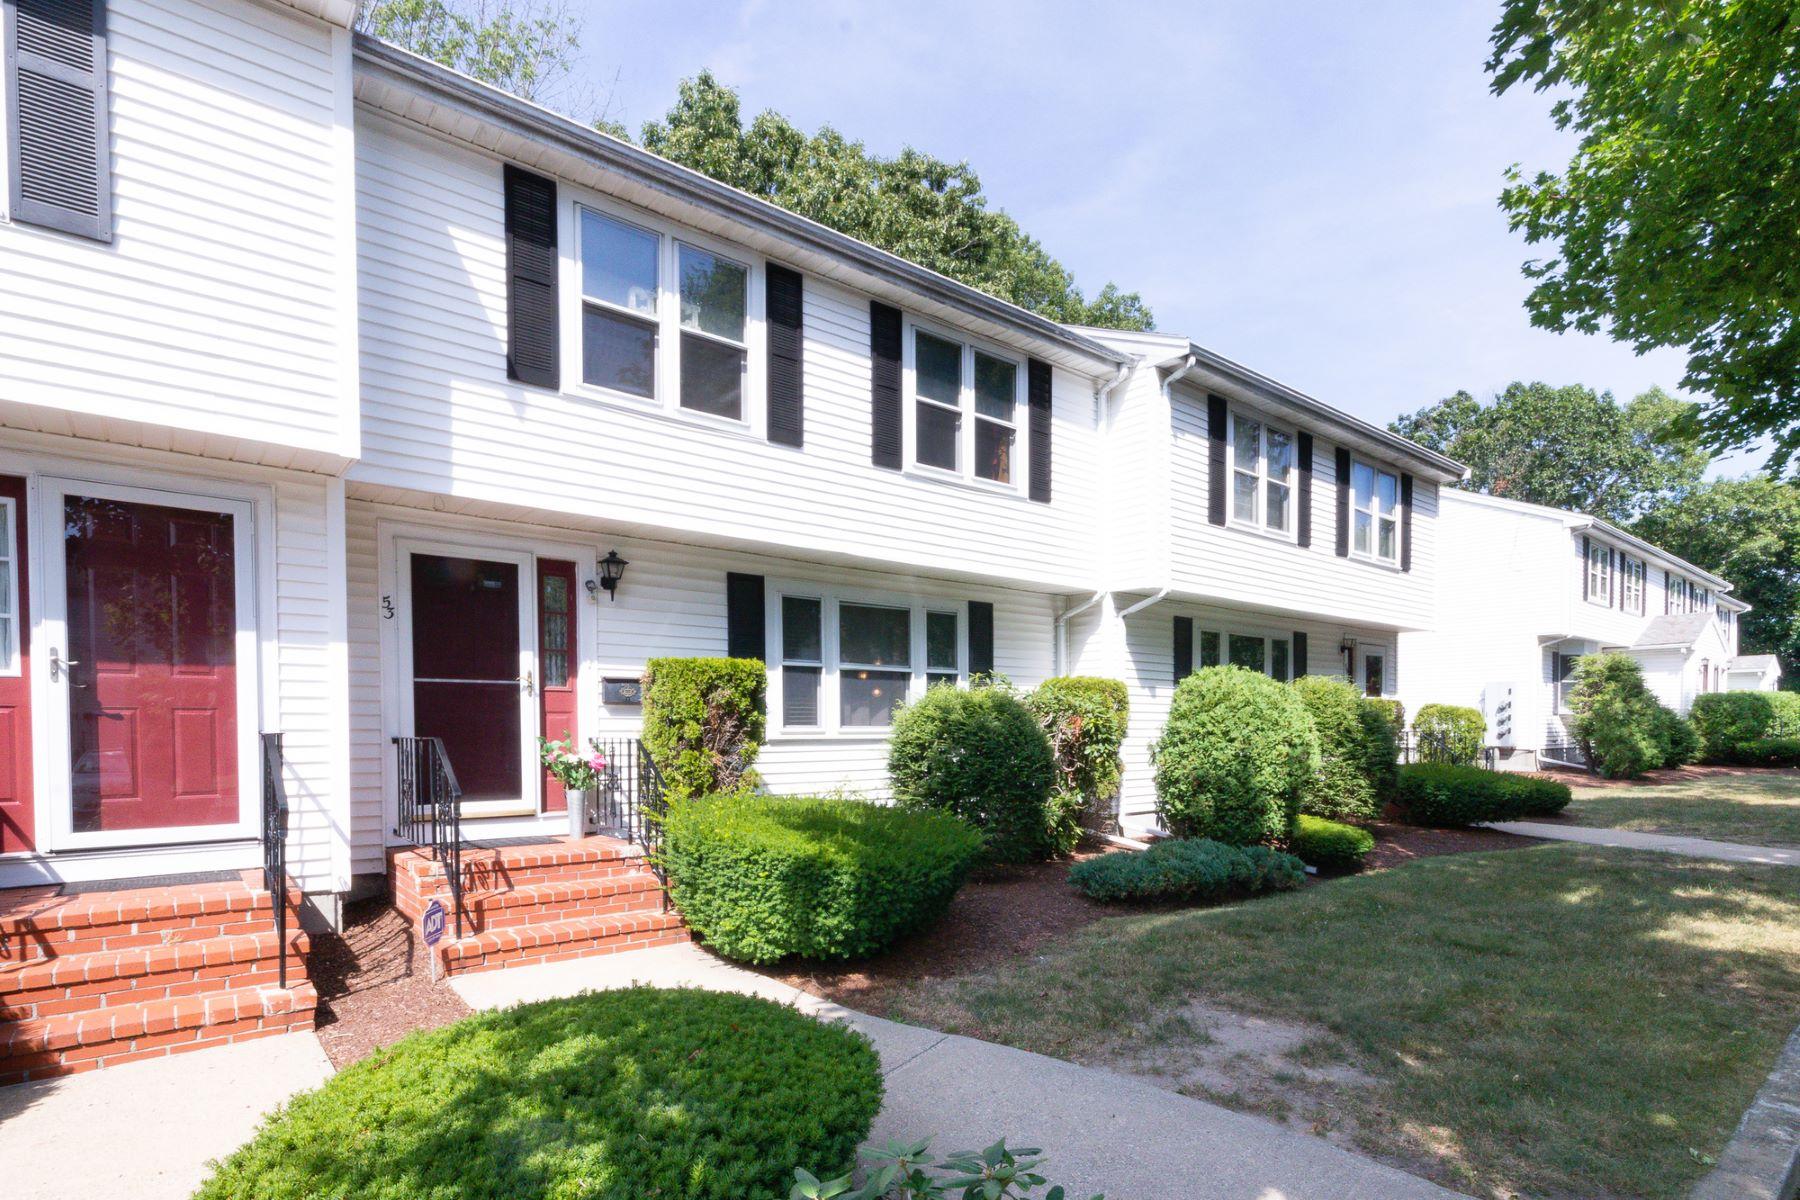 Condominiums 为 销售 在 53 Reservoir St, #53 布罗克顿, 马萨诸塞州 02301 美国